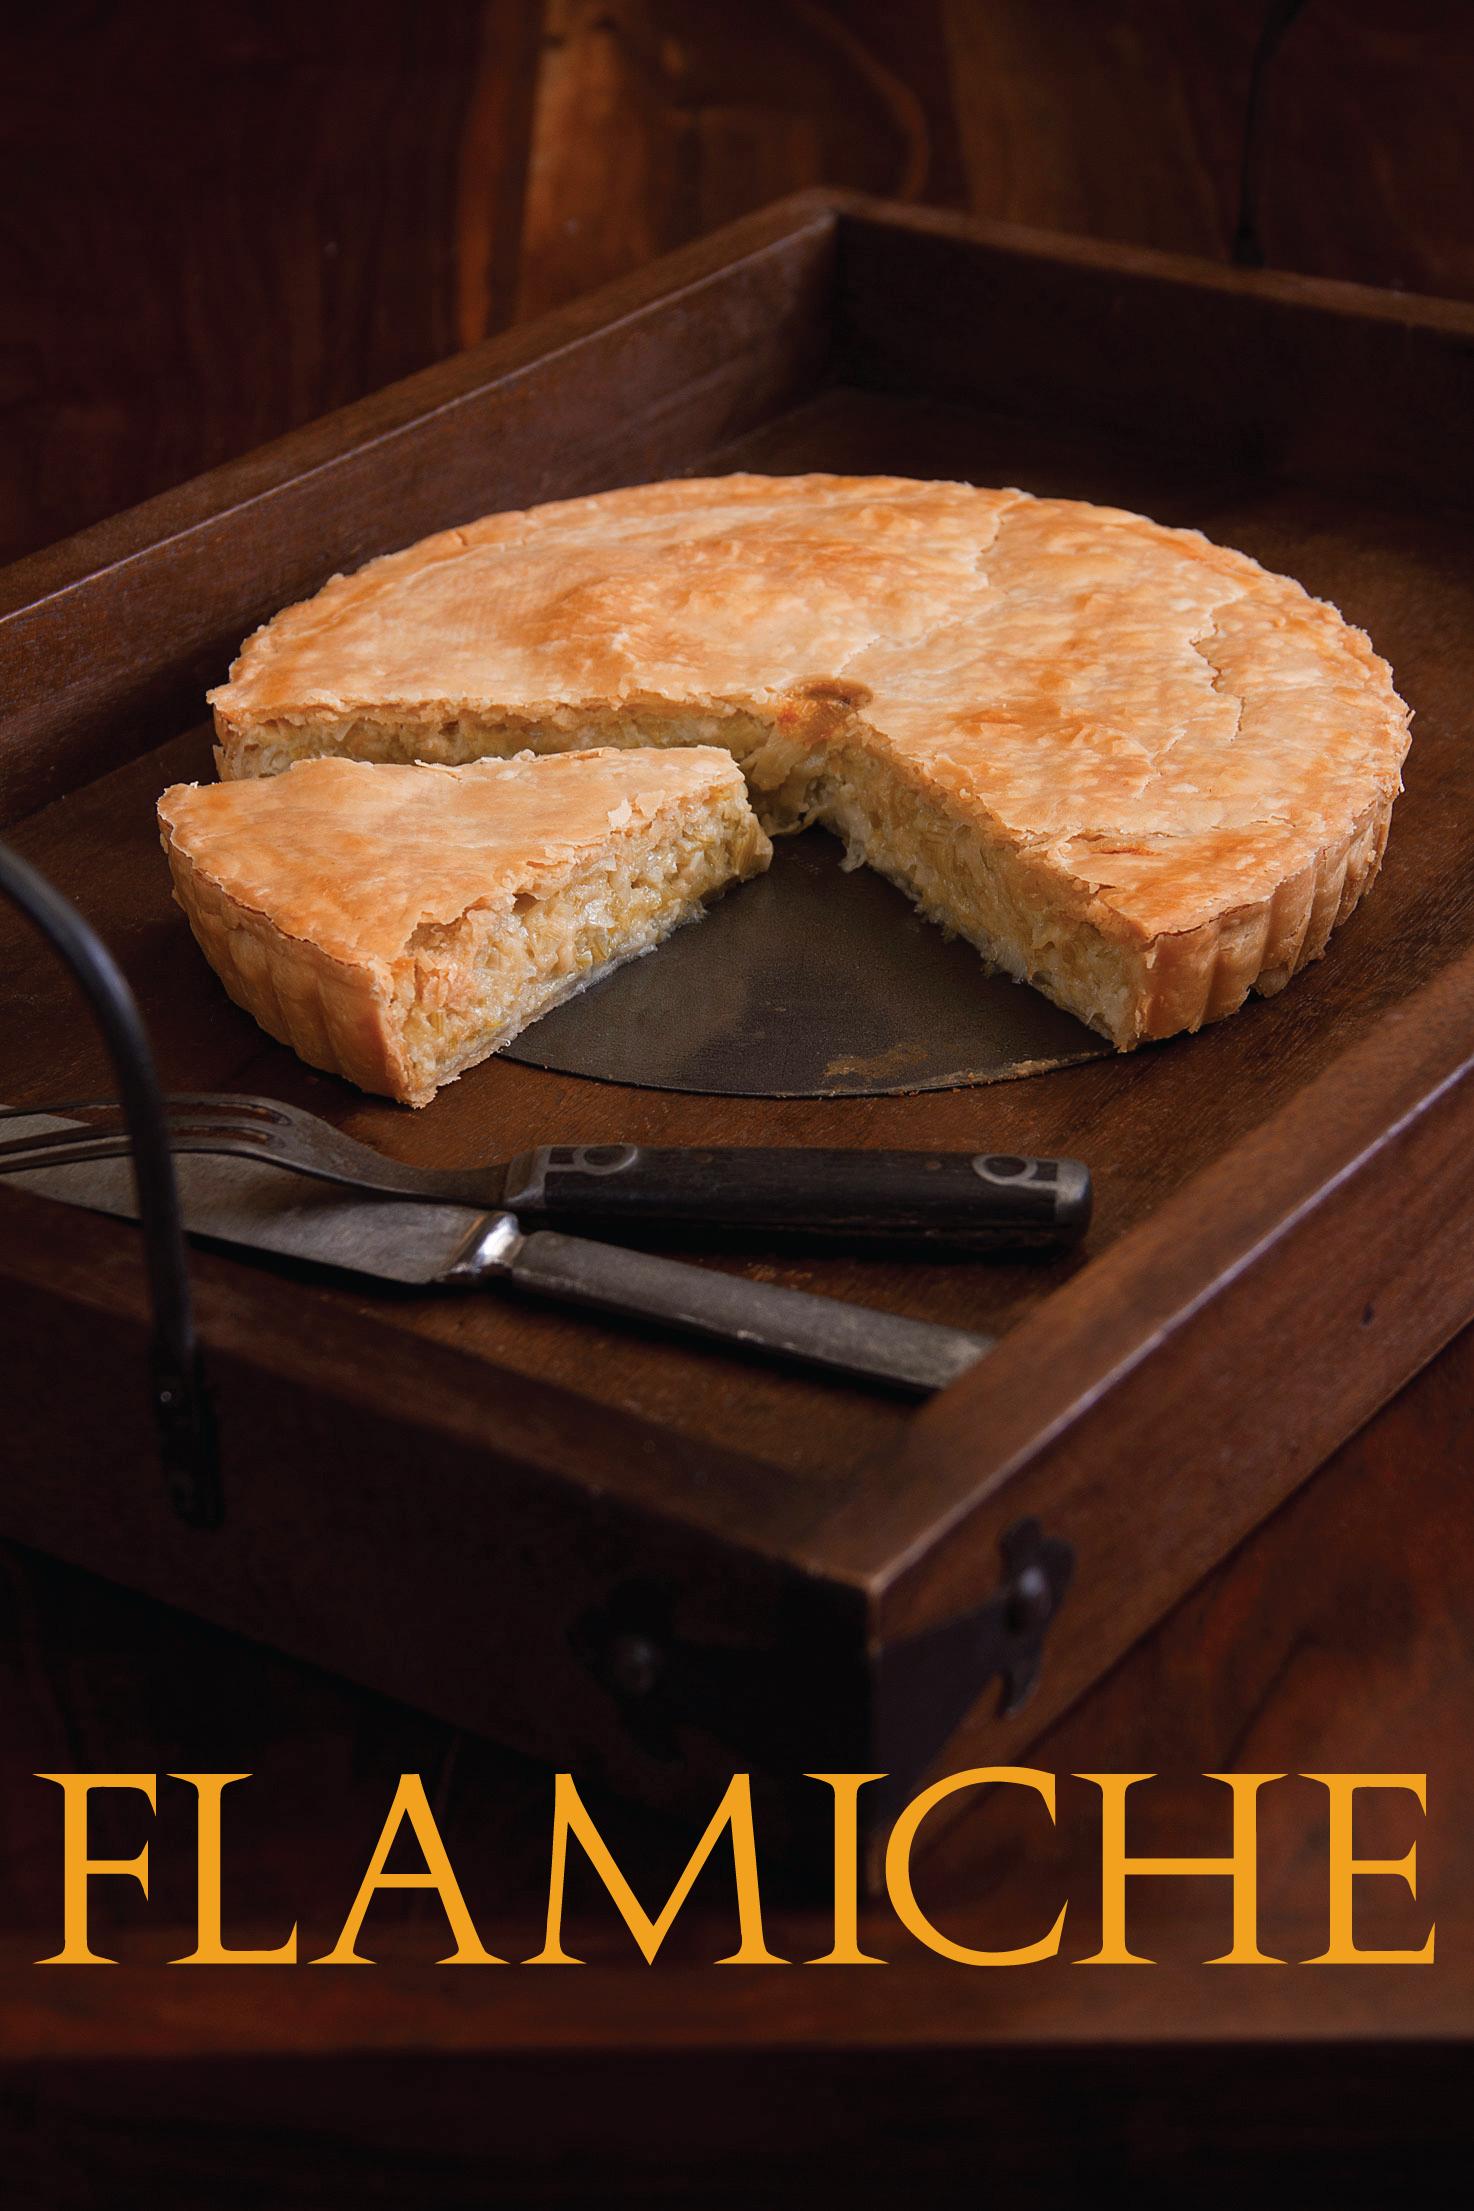 leek and egg flamiche